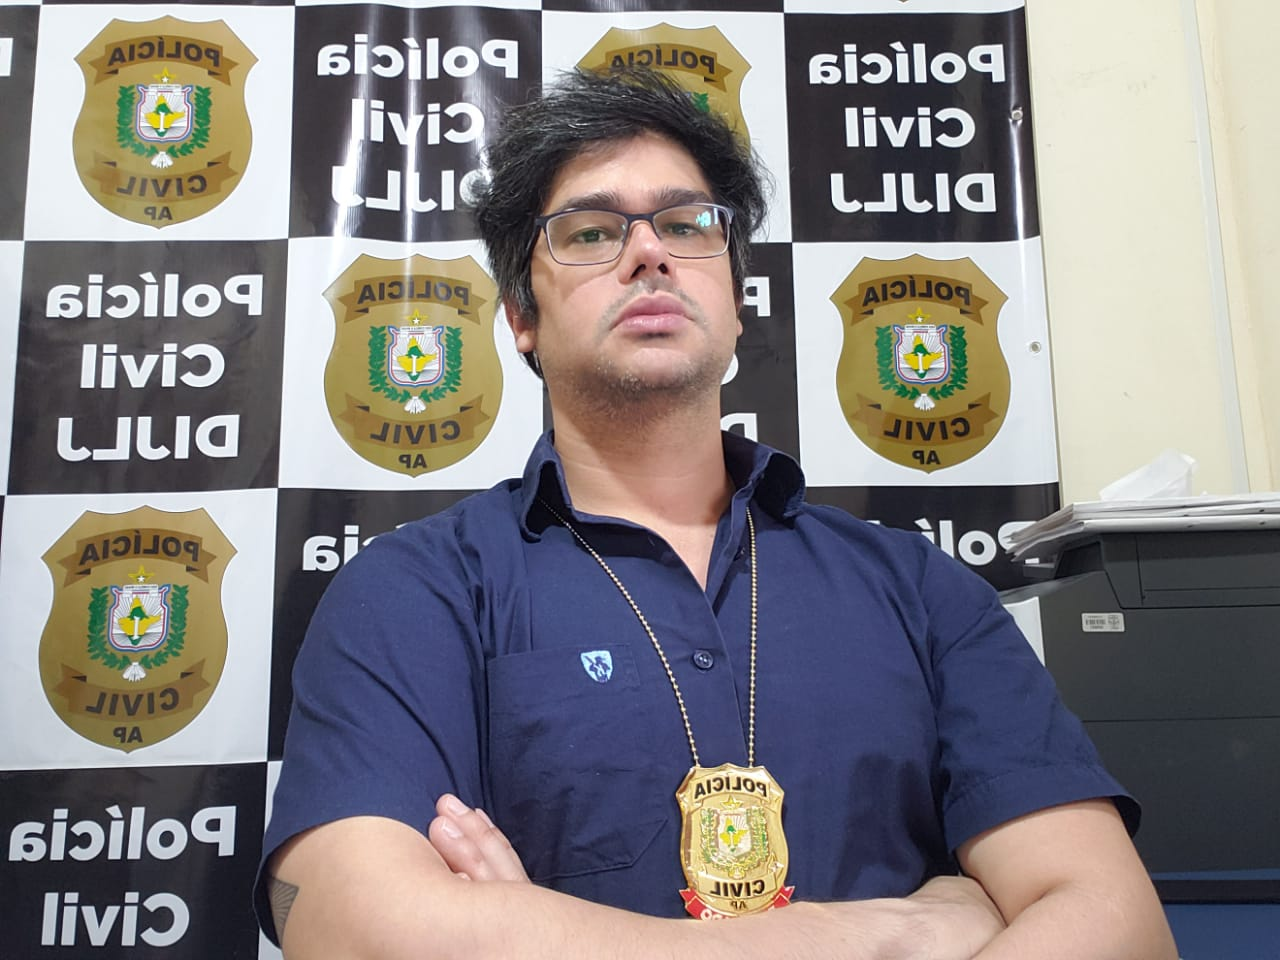 <h4>Doutor Aluisio Aragão de Souza Junior</h4>